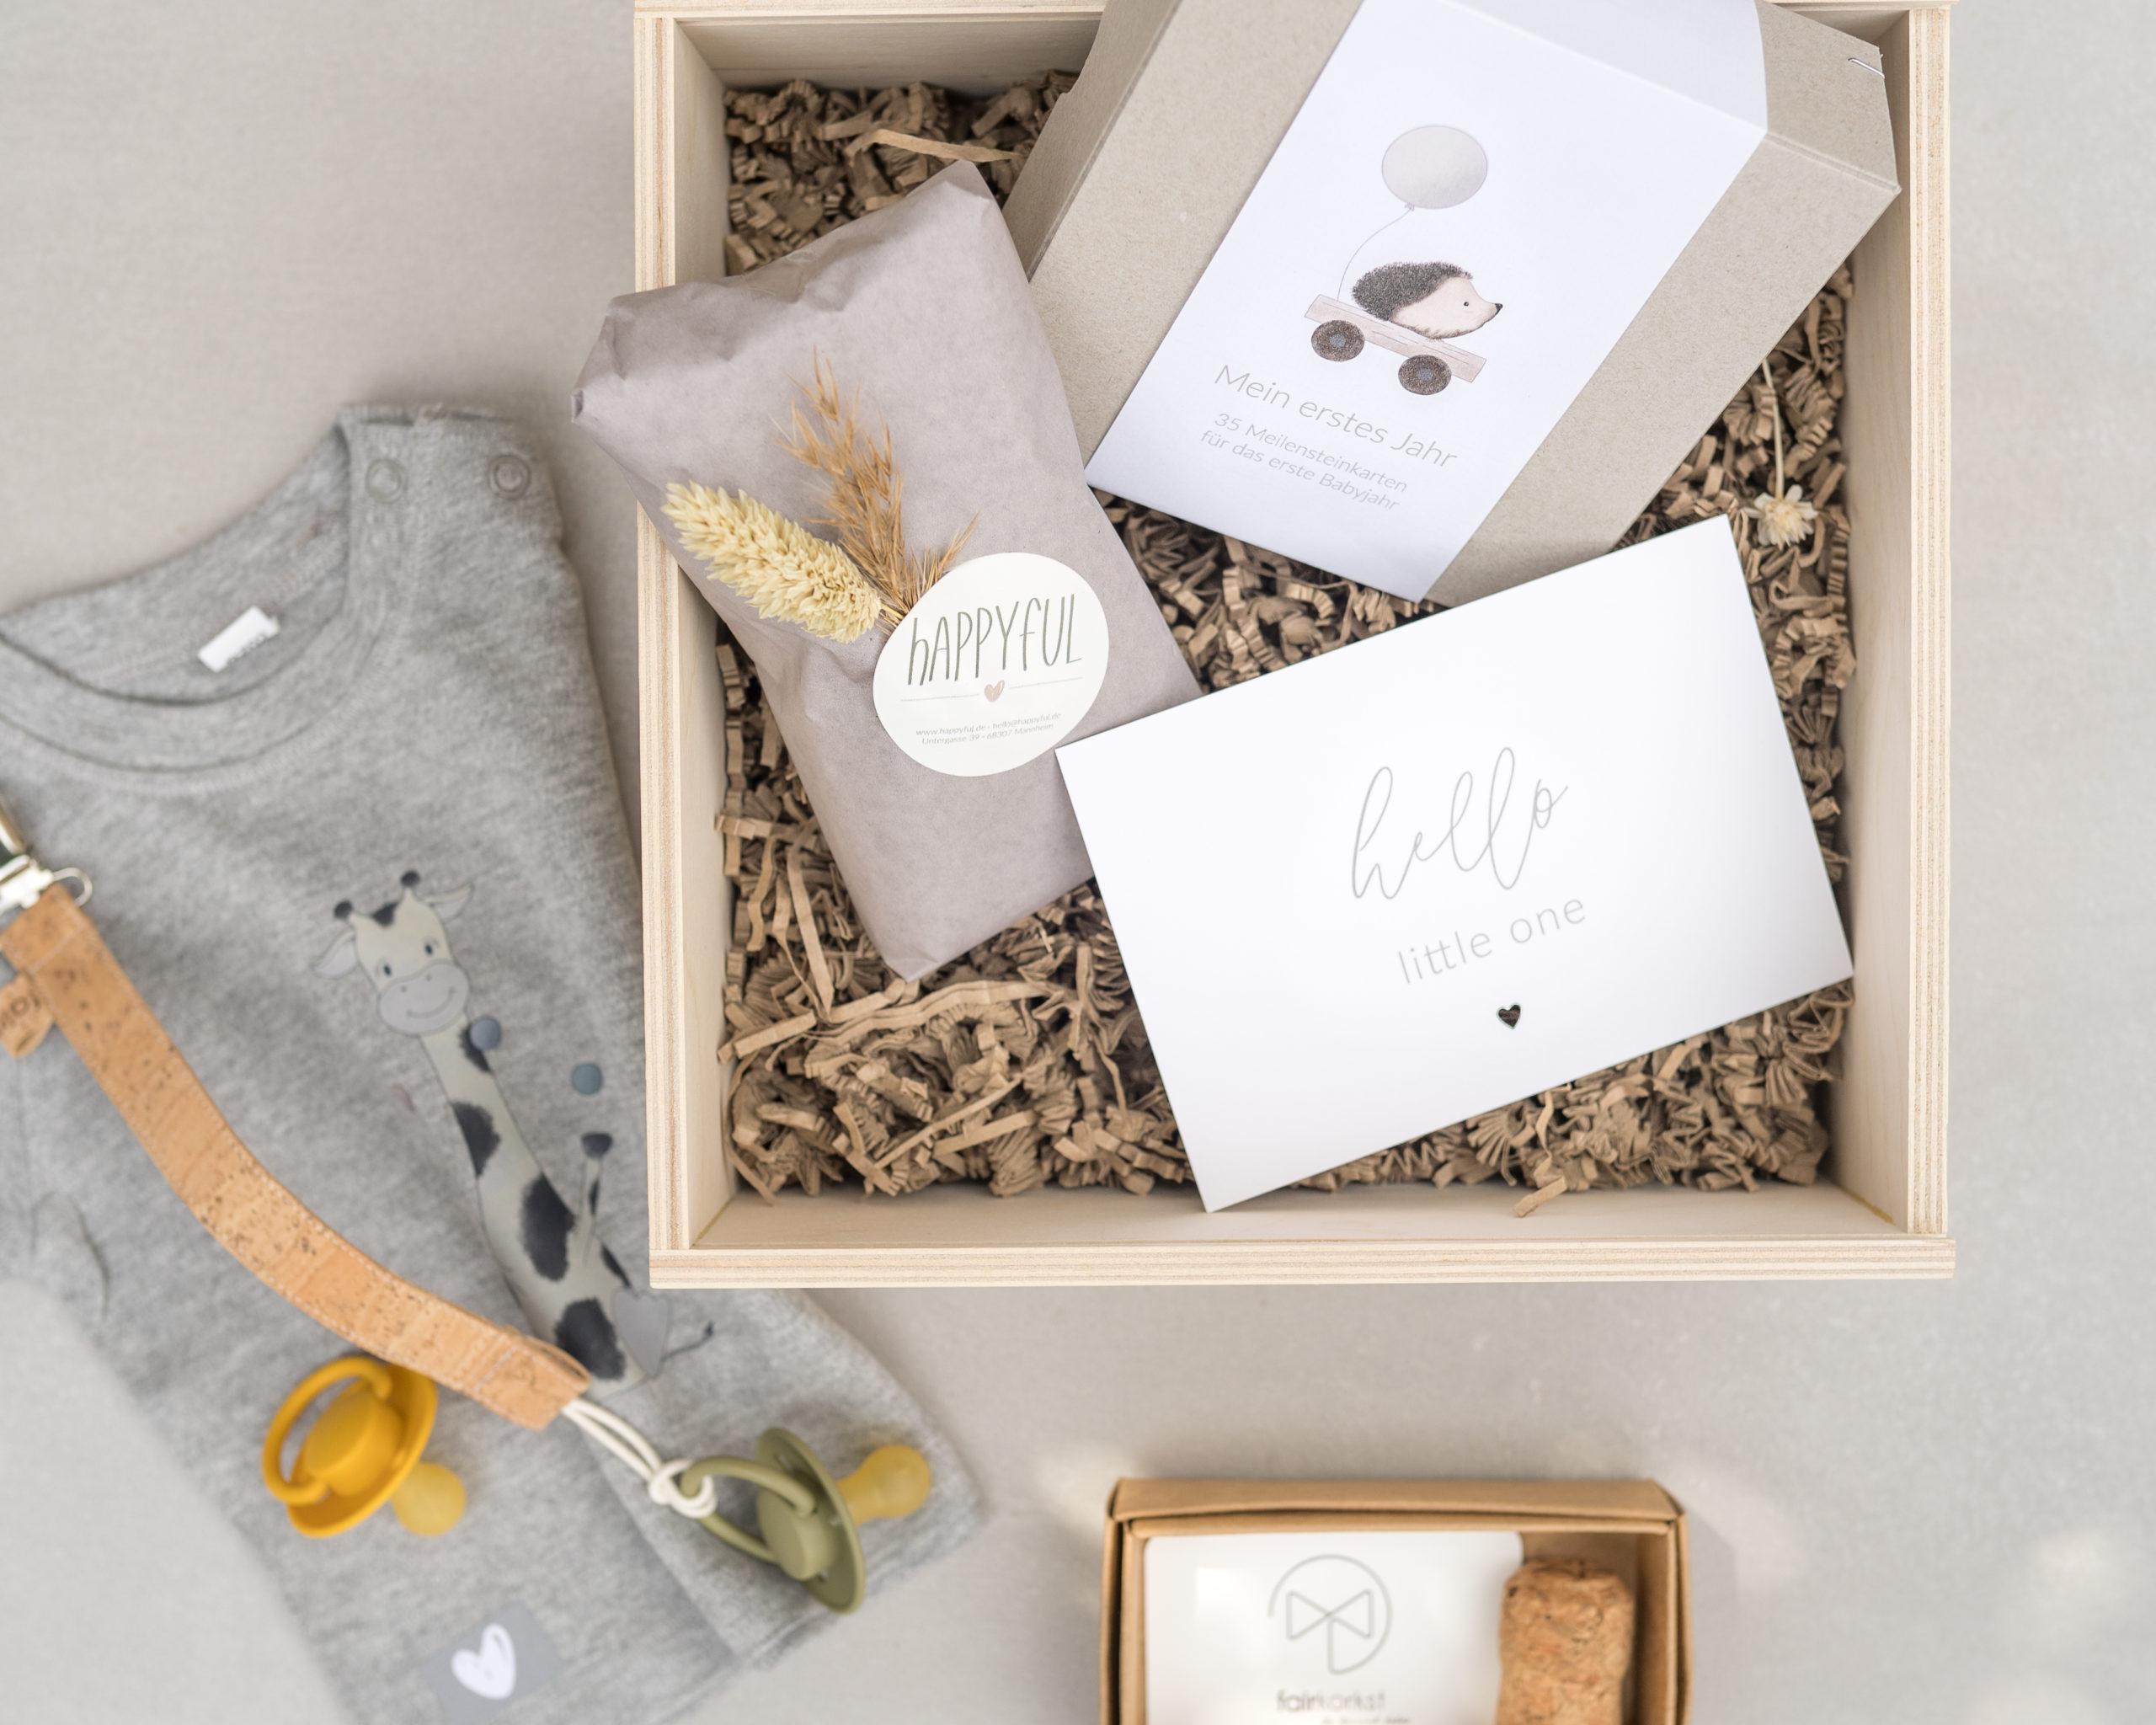 Geschenke zur Geburt - Hooray a Baby Geschenkbox   hey-julisa.com